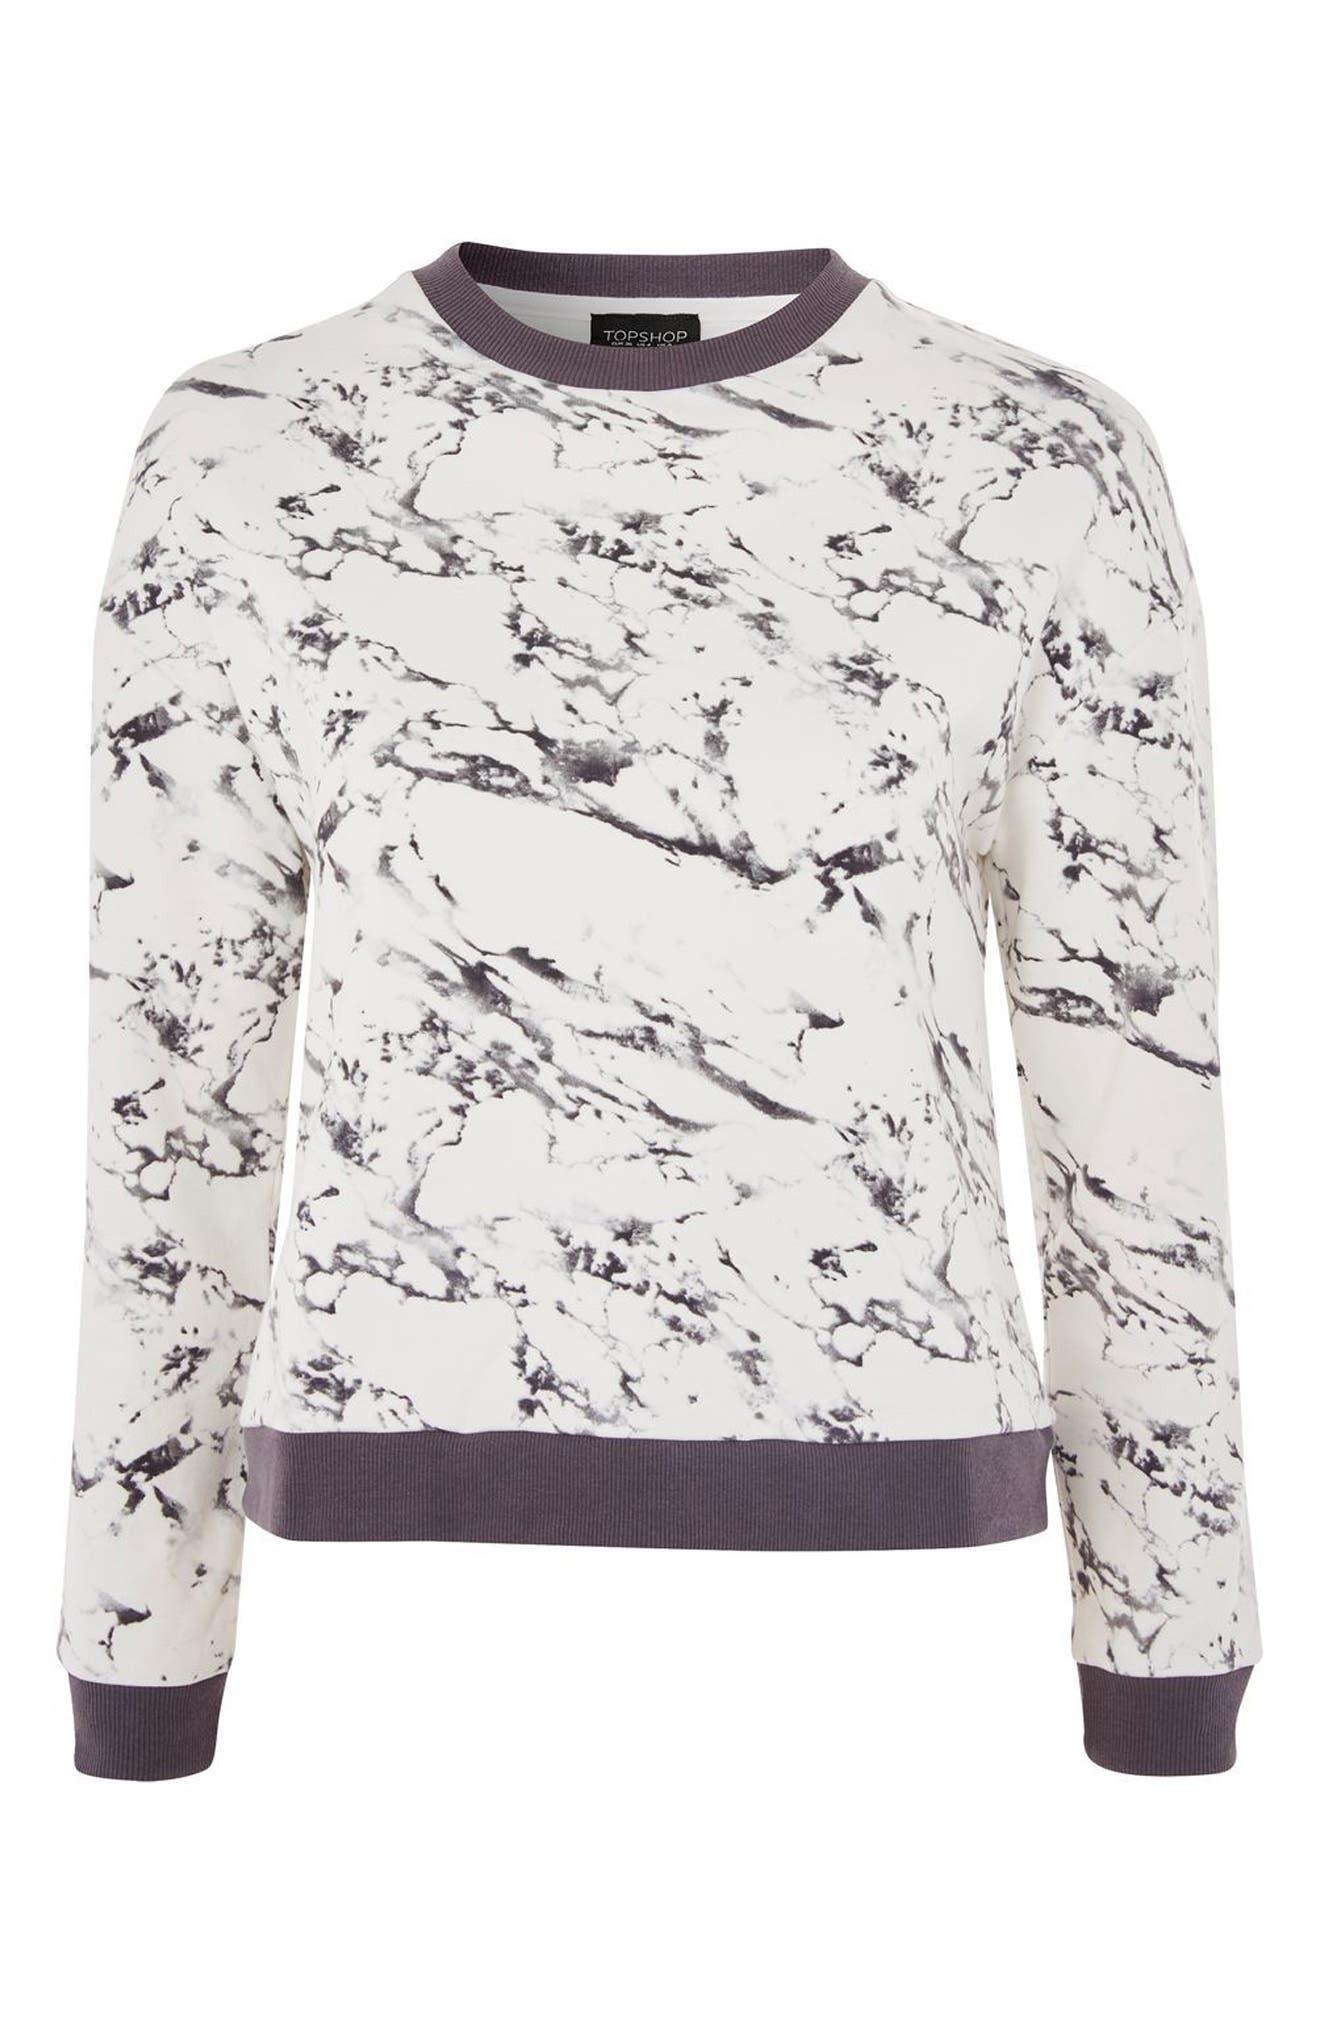 Marble Print Lounge Sweatshirt,                             Alternate thumbnail 2, color,                             020